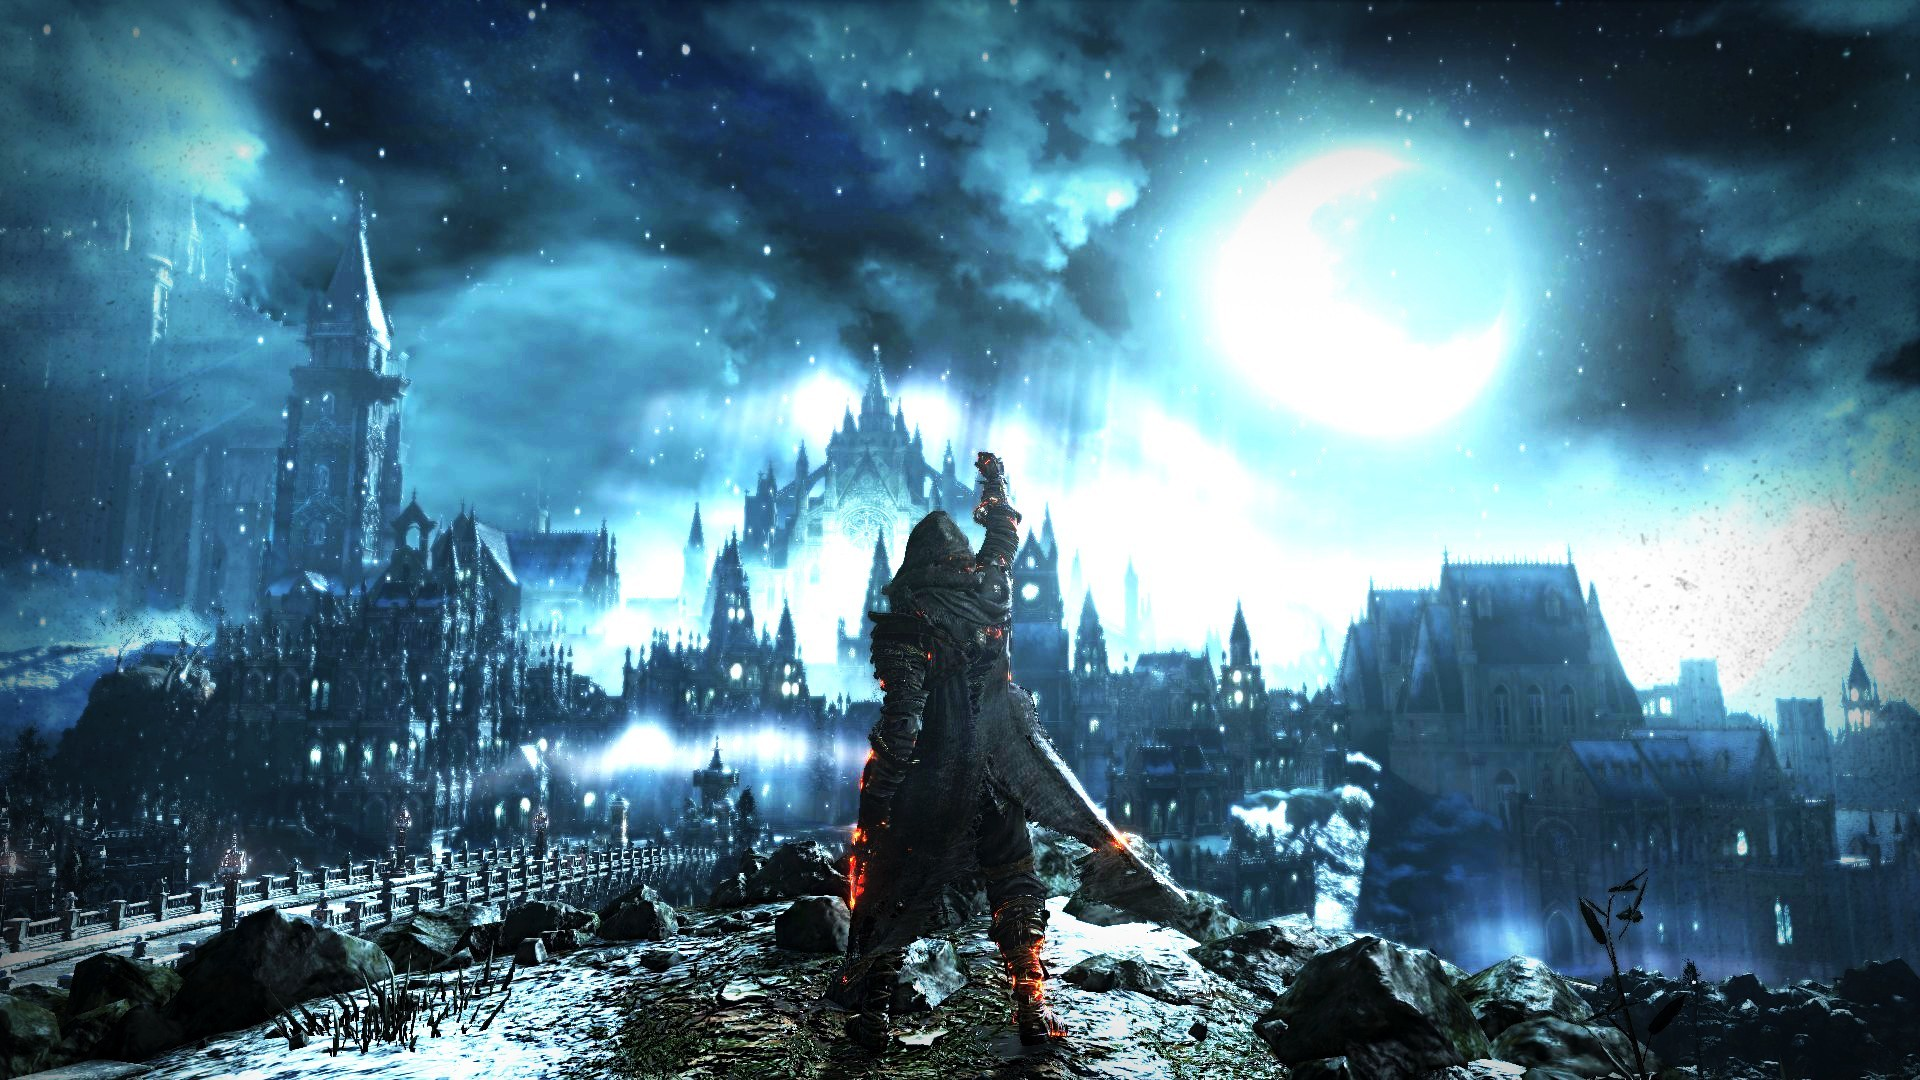 General Dark Souls Moon architecture Dark Souls III